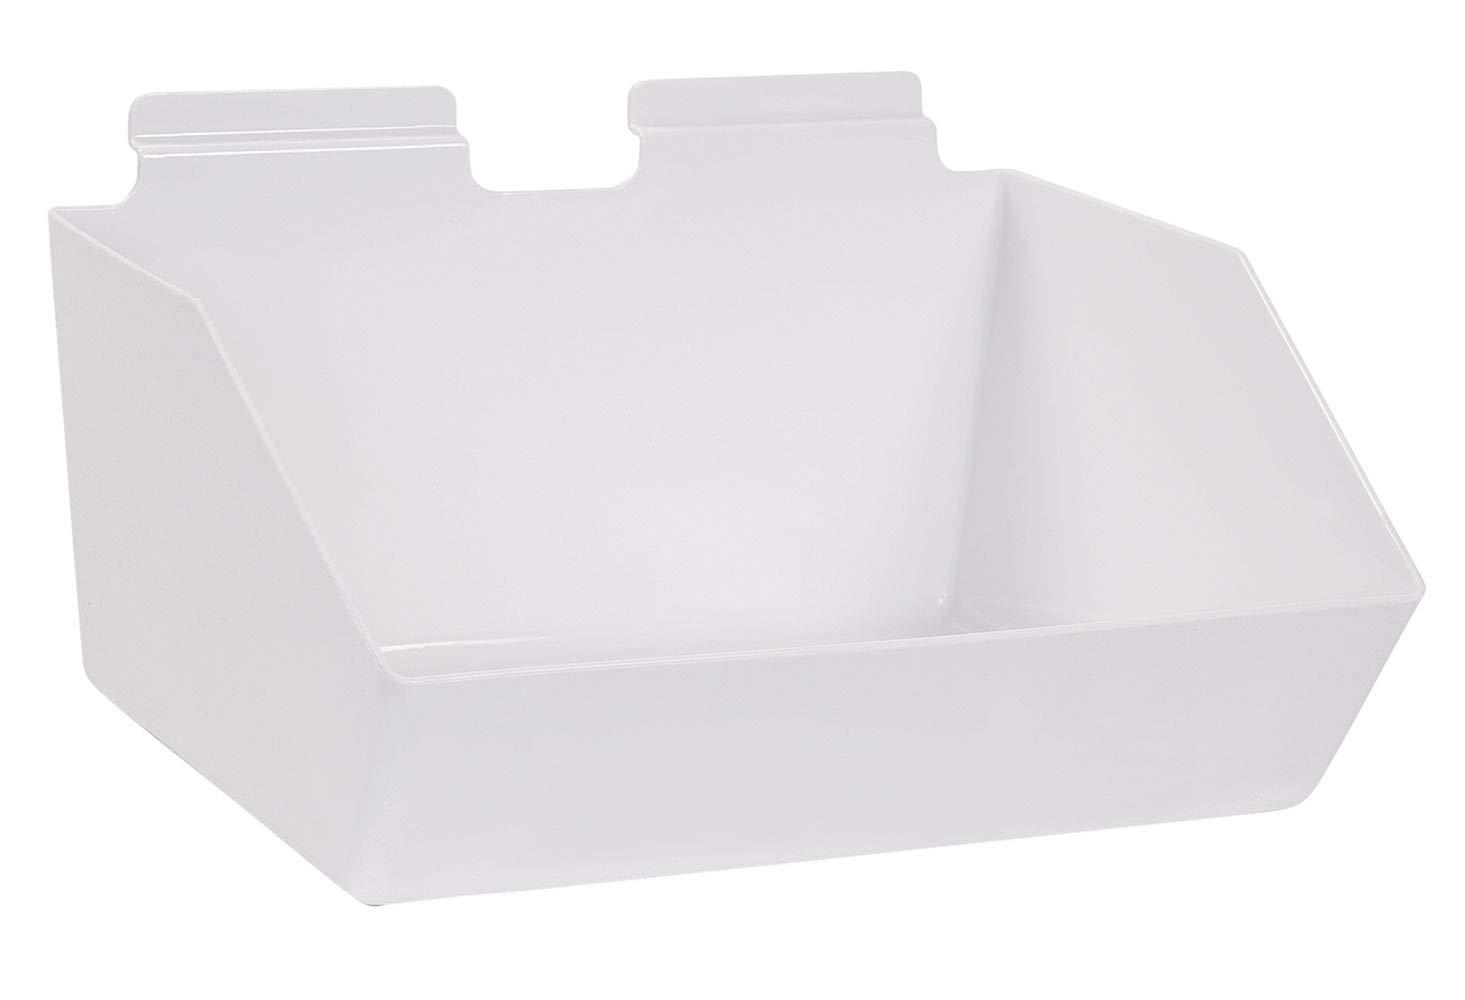 12 x 5 ½ 9 inch White - Dump Plastic New sales Bin Max 63% OFF Slatwall for